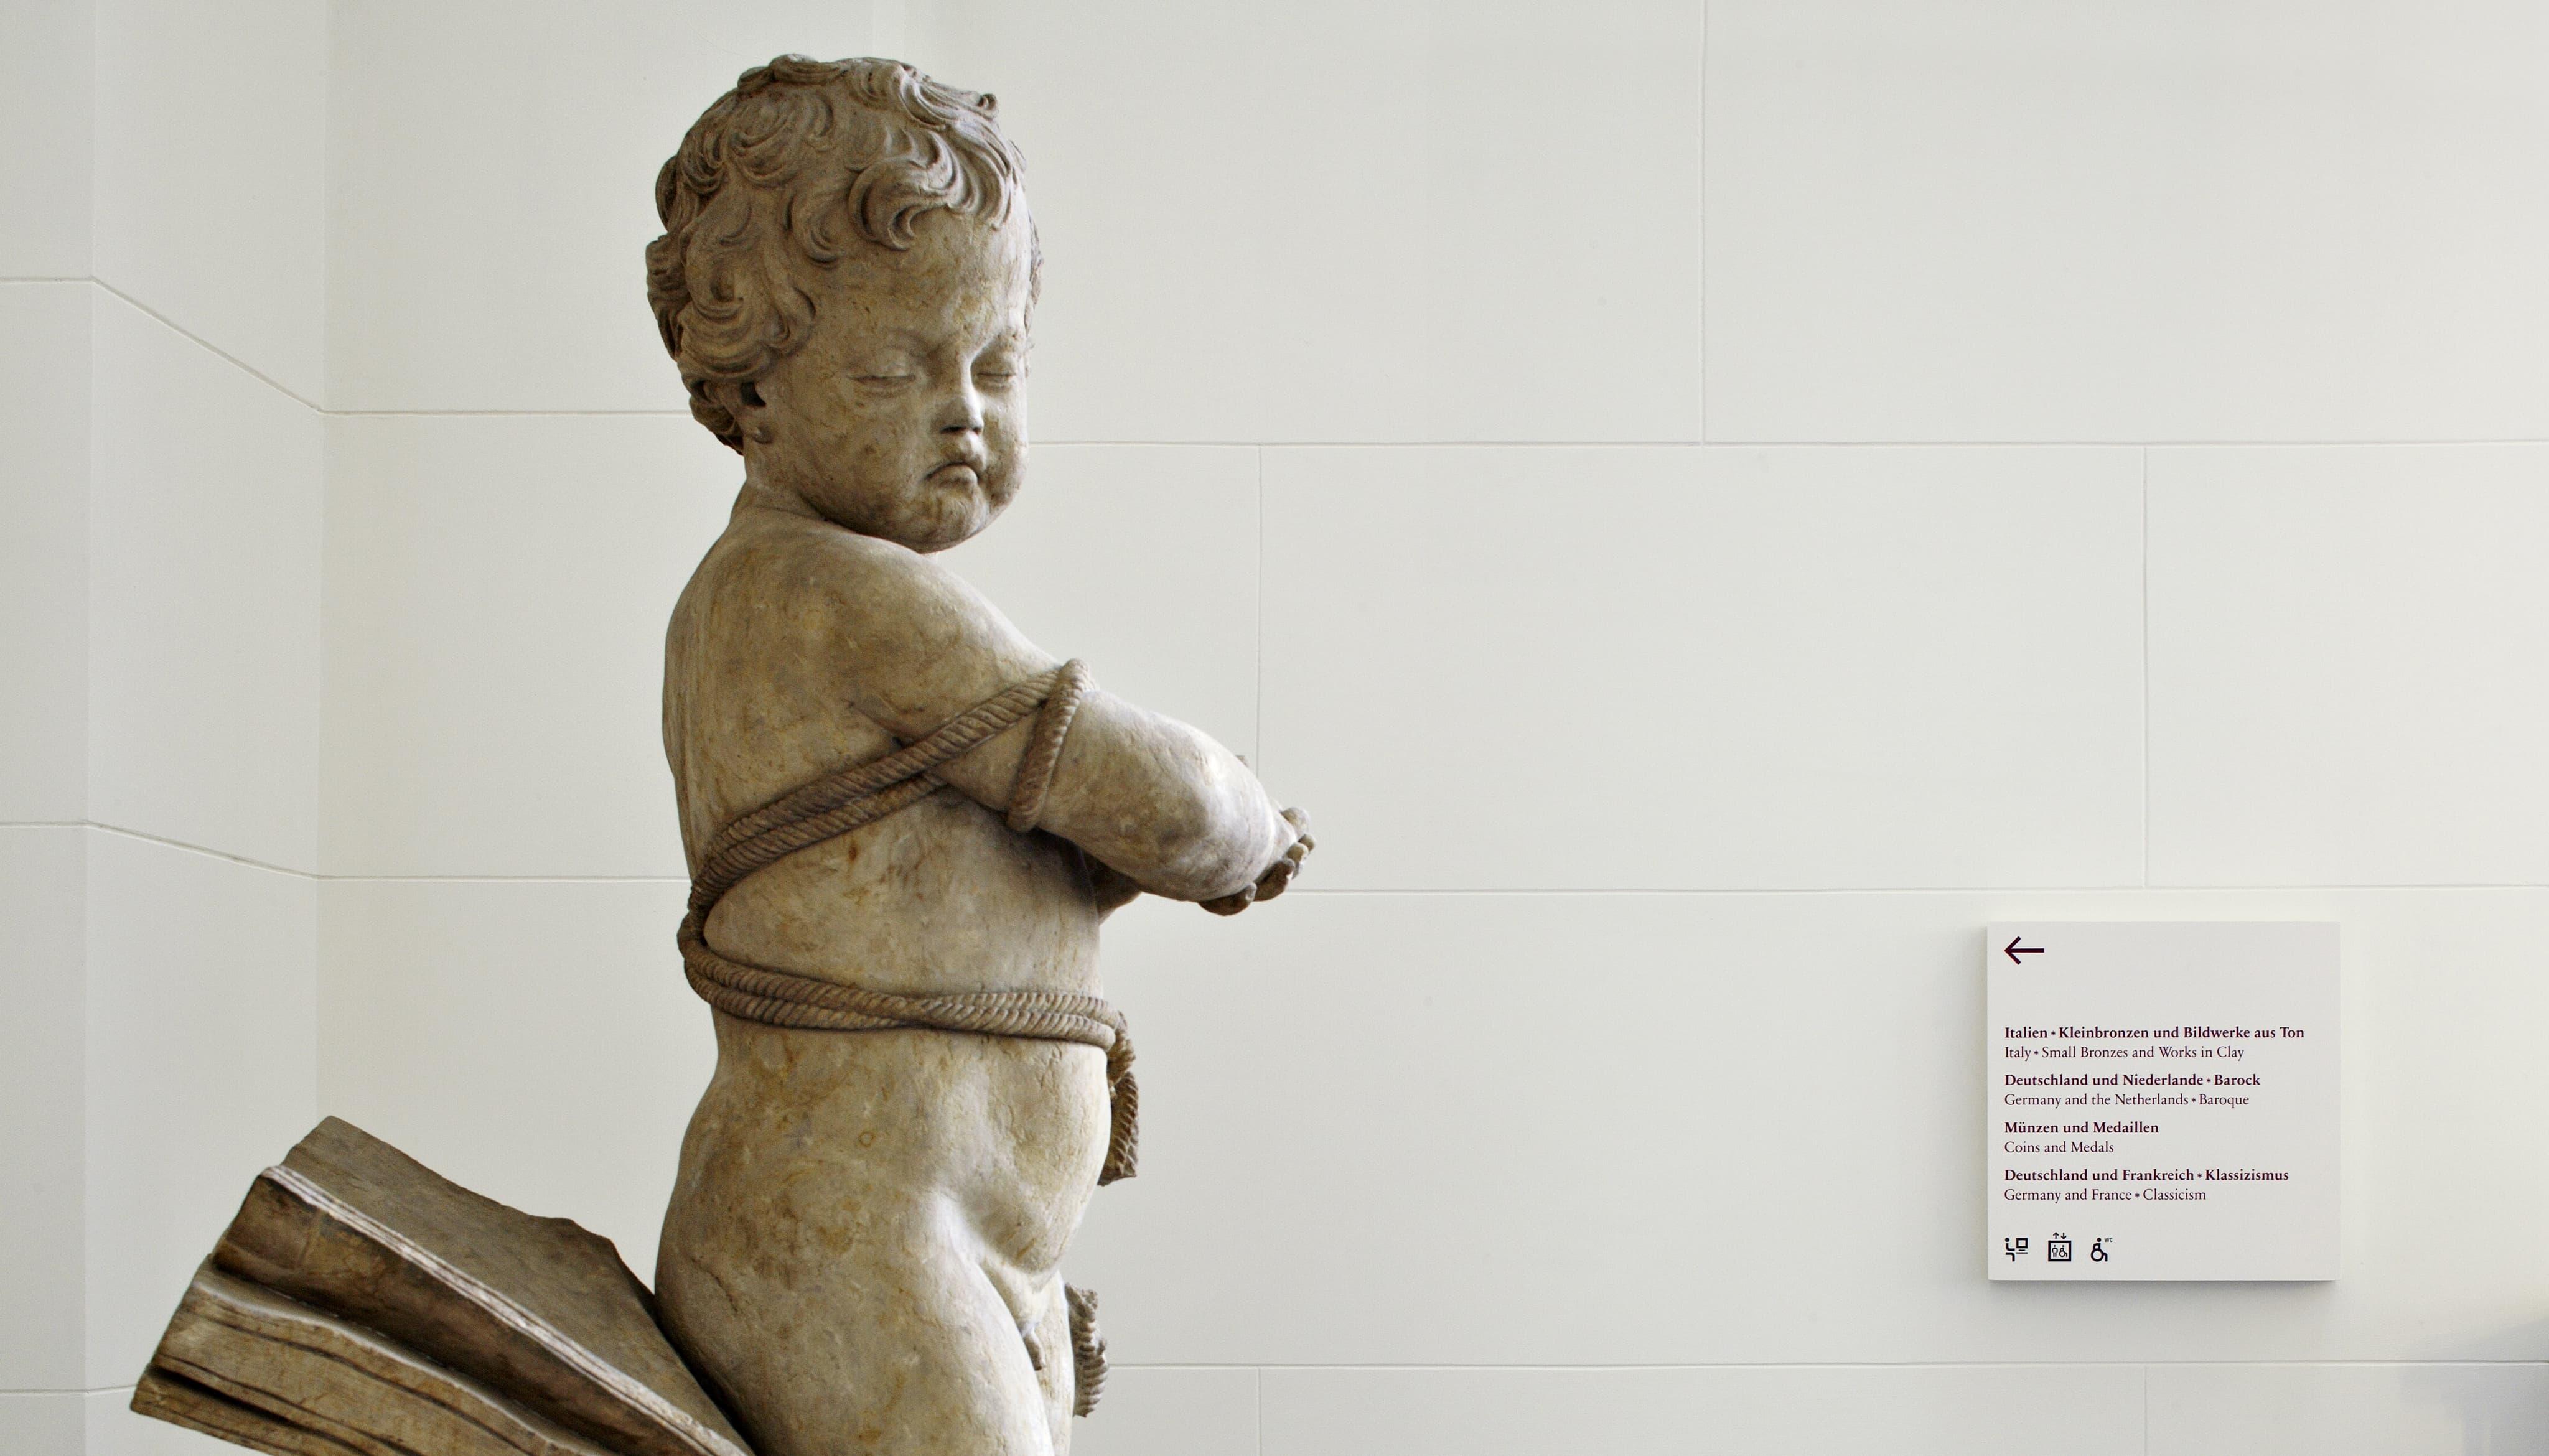 Museumsinsel Berlin Leitsystem Signaletik Gesamtkonzept Innenraum Wegweiser mit Skulptur